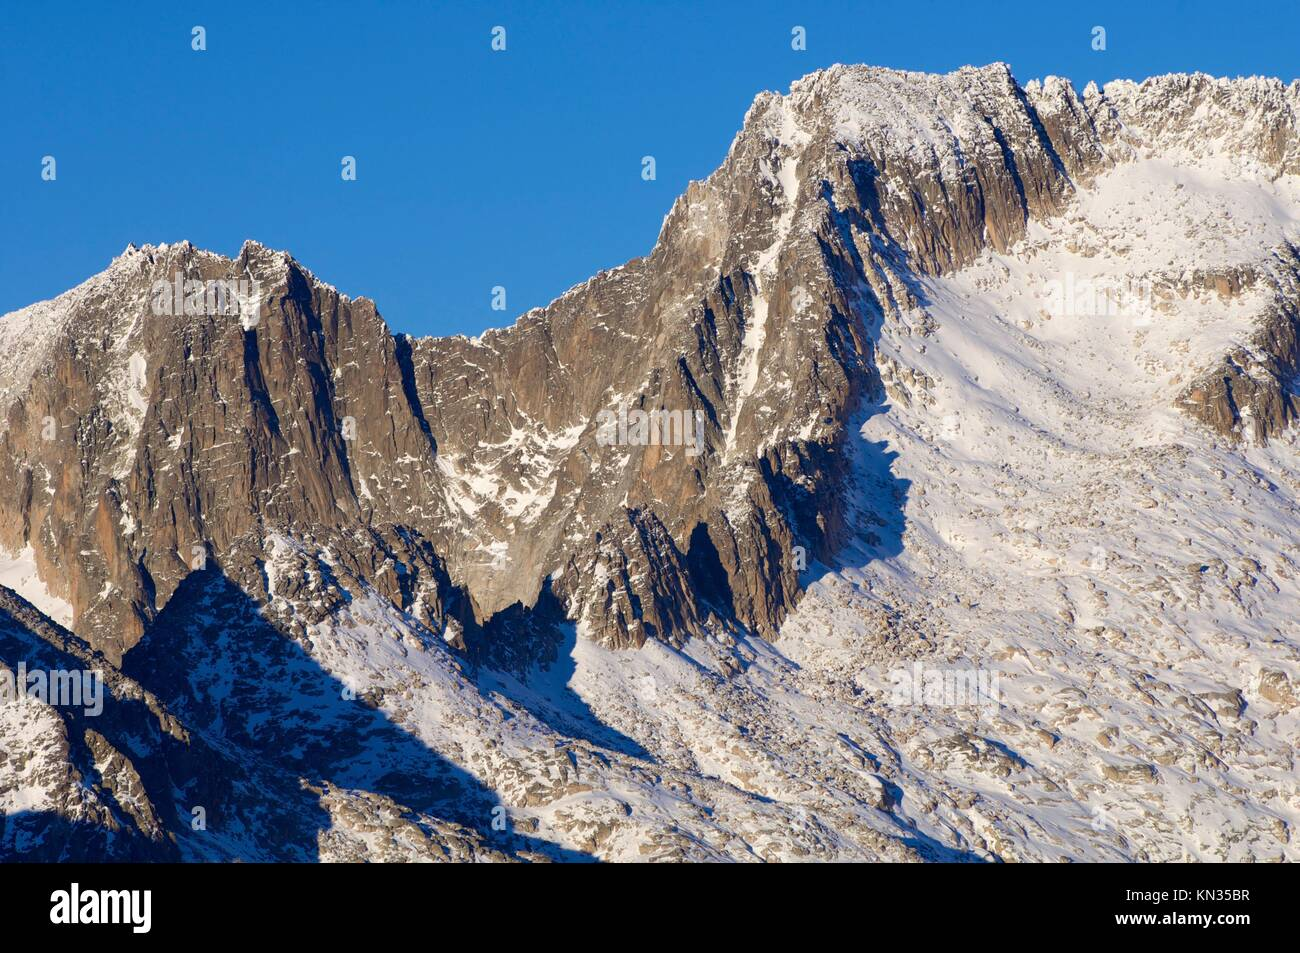 Maladeta Peak and Maldito Peak in the Maladeta Massif, Posets Maladeta Natural Park, Huesca, Aragon, Pyrenees, Spain. Stock Photo